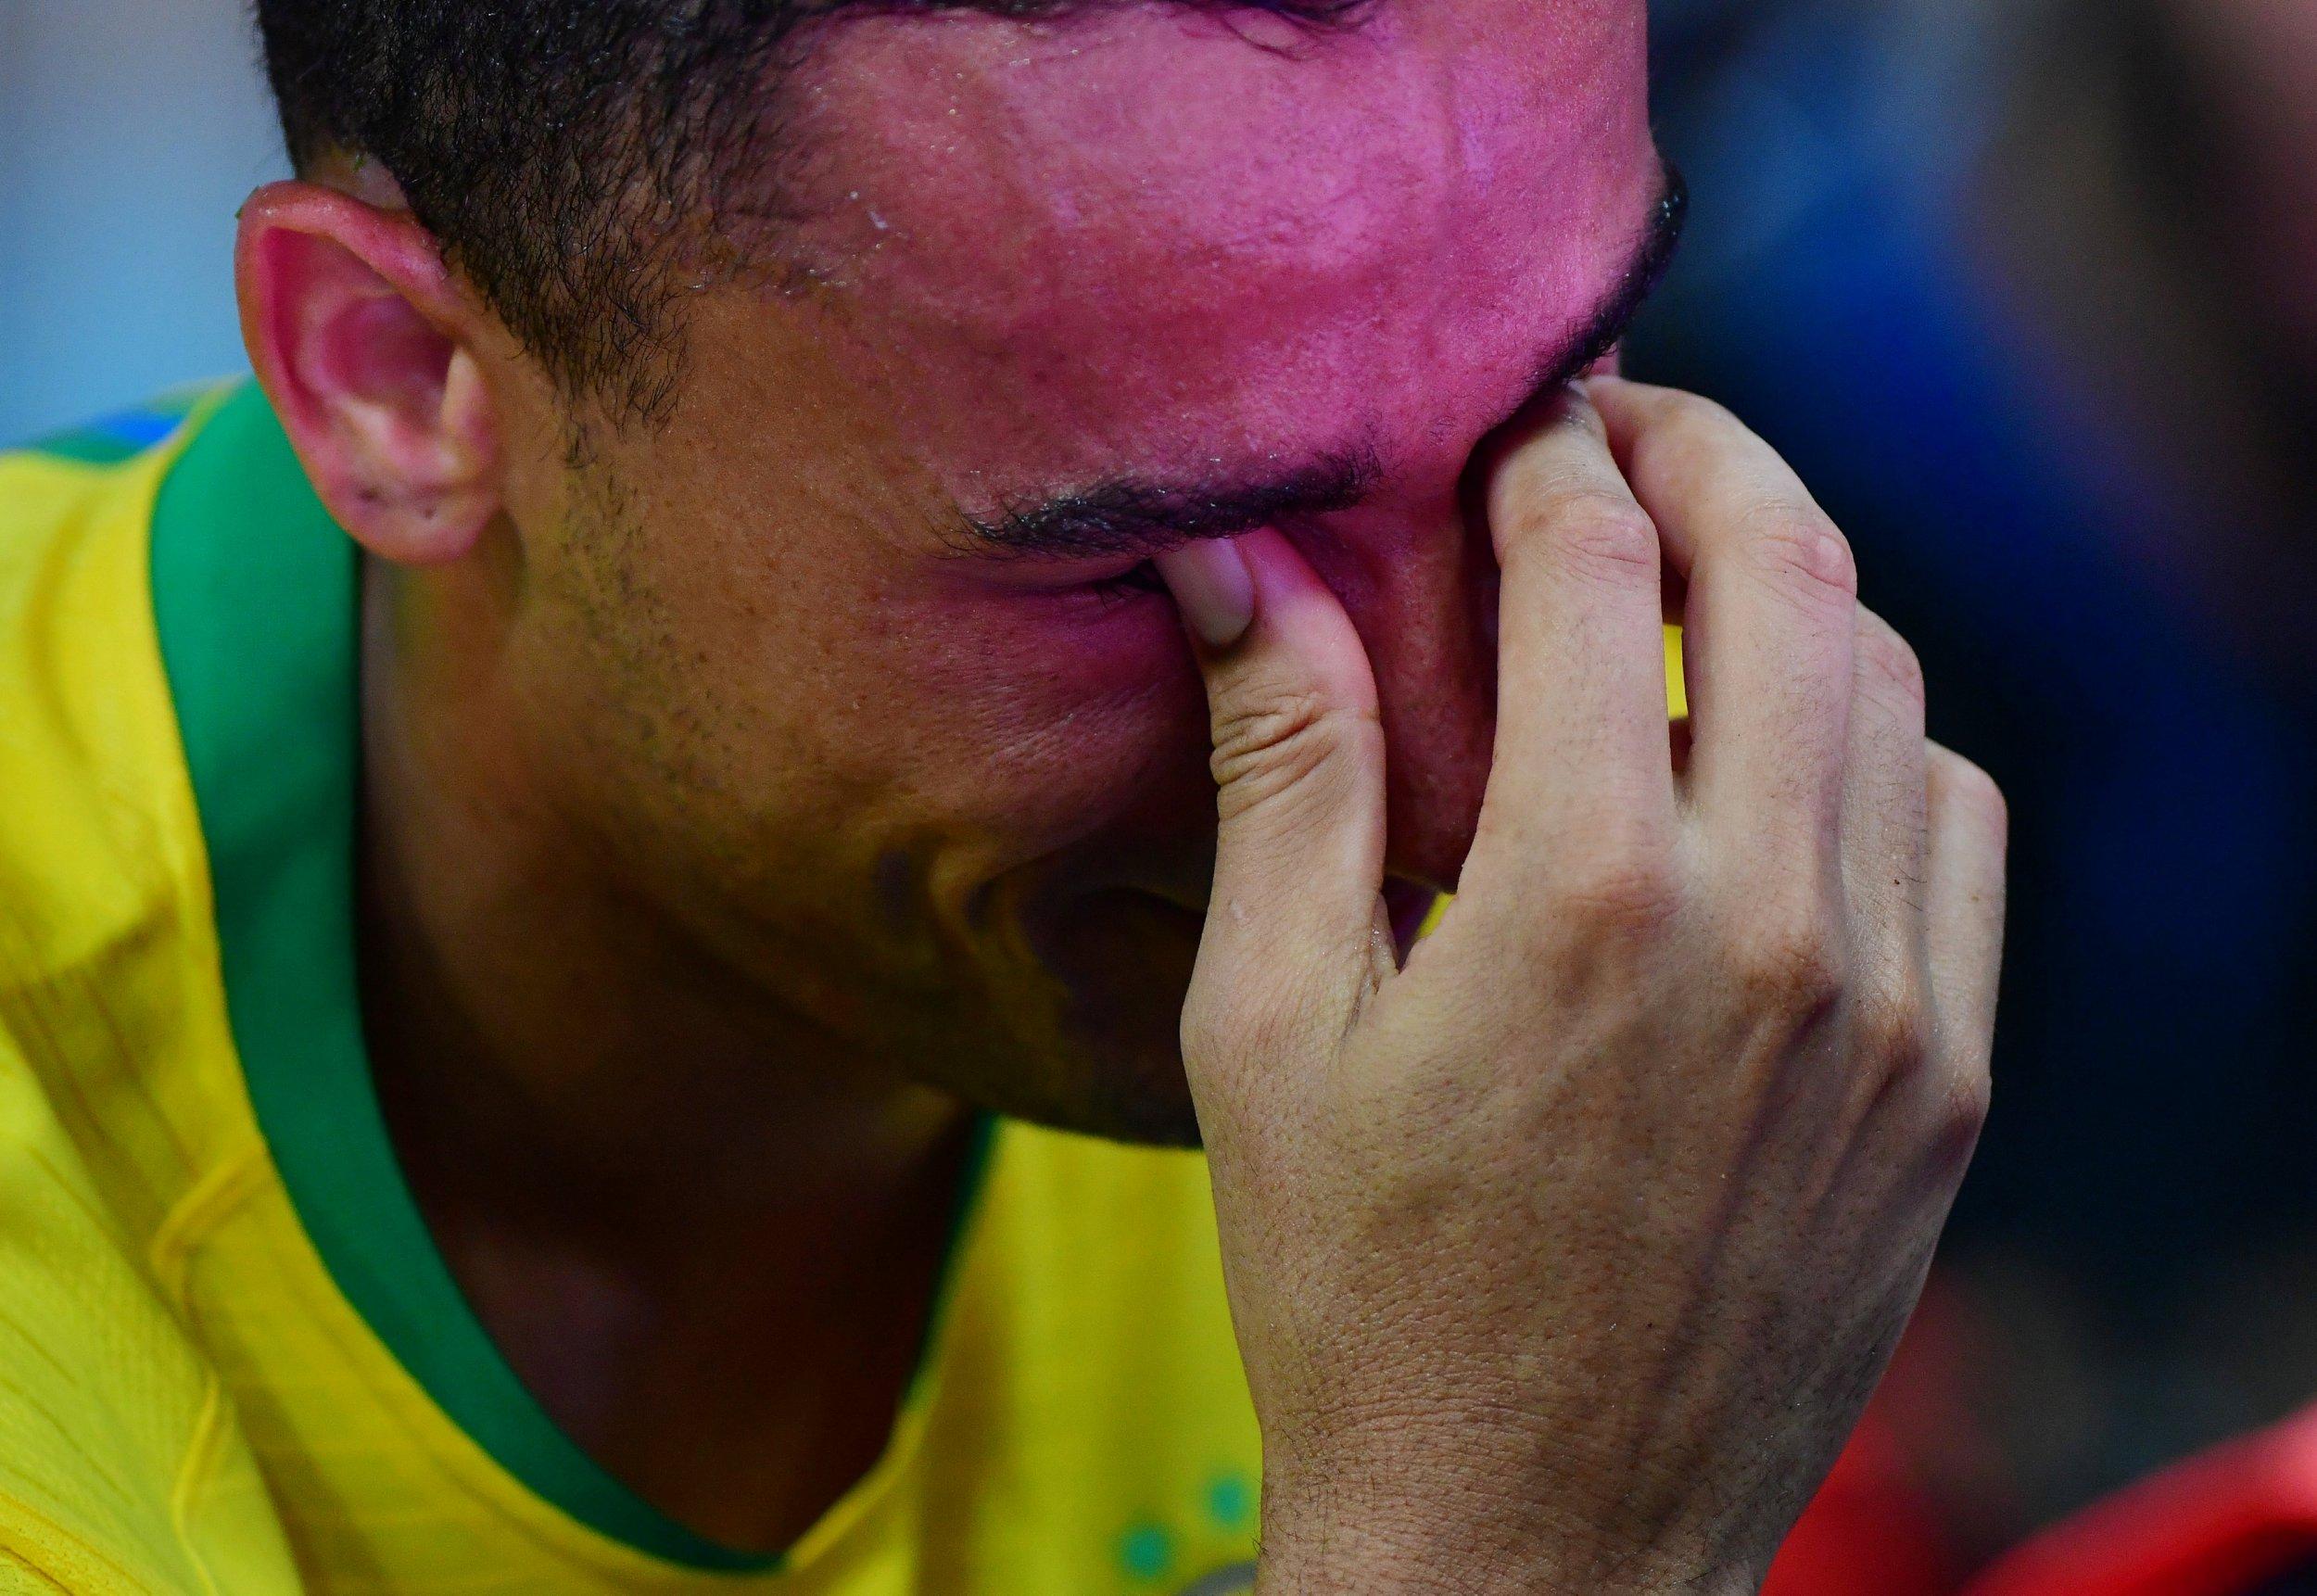 Man City star Danilo breaks down in tears after injury in Brazil vs Argentina